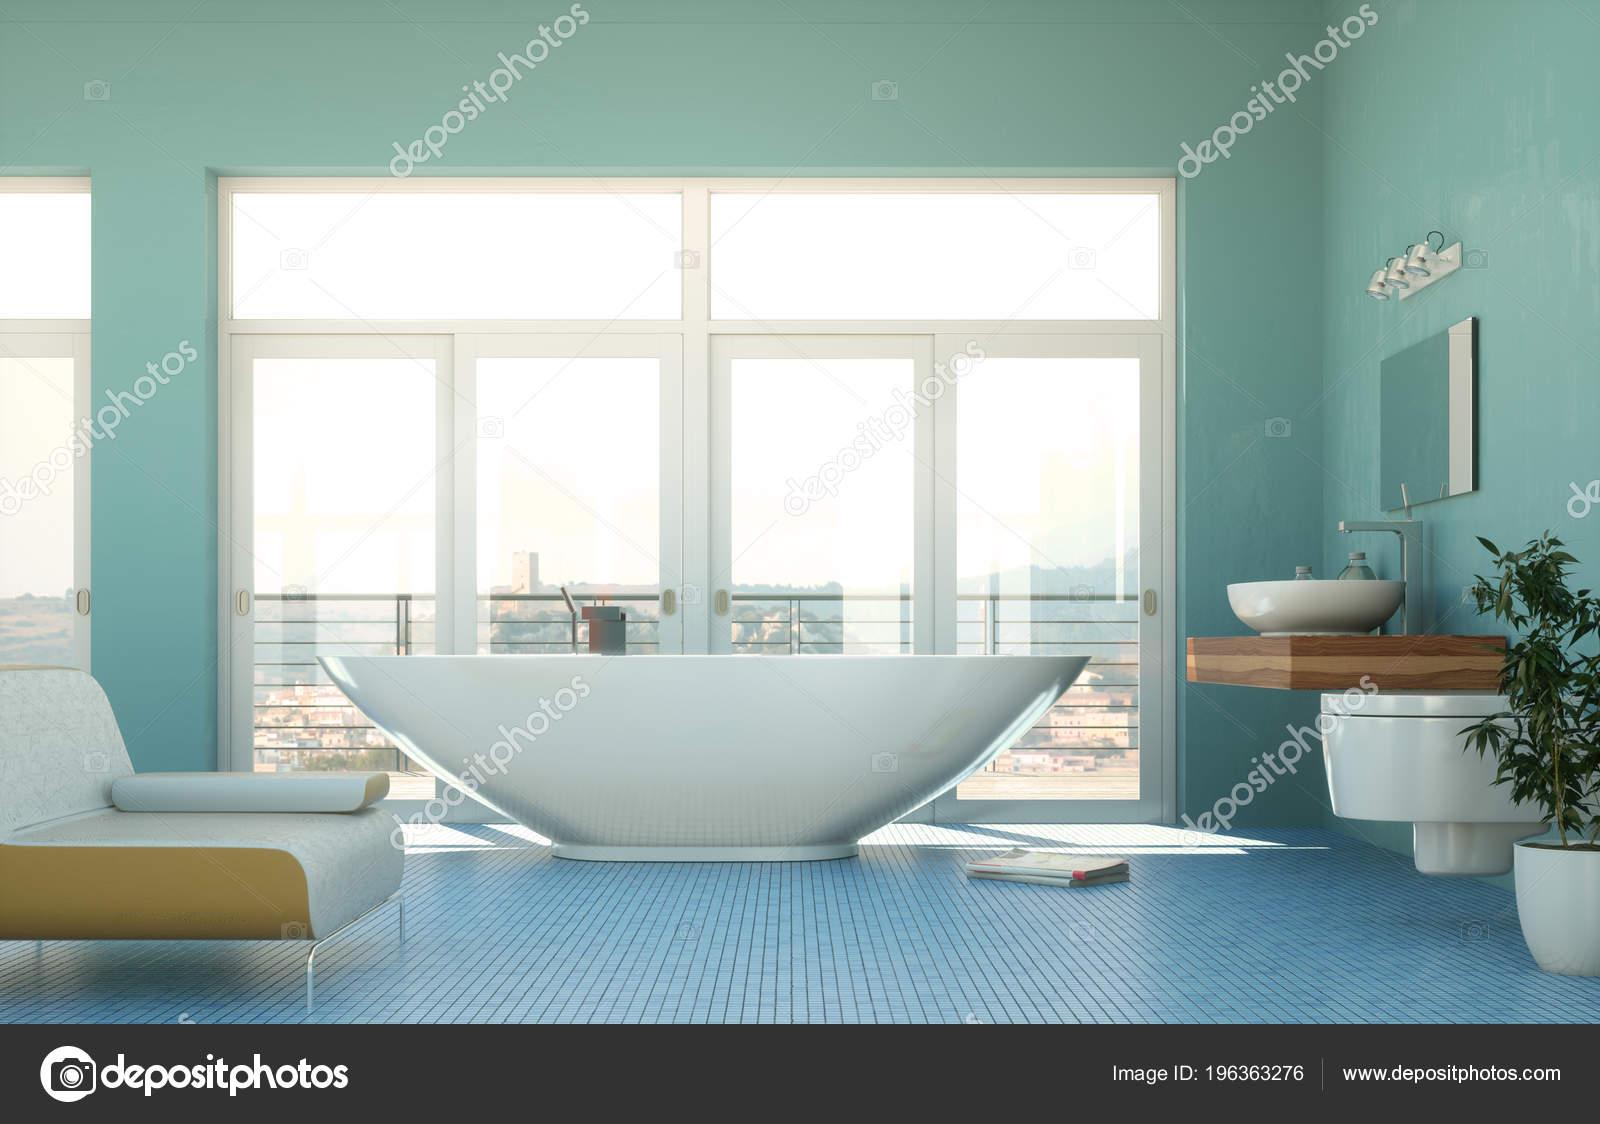 Escena de representación 3d moderno cuarto de baño diseño de ...